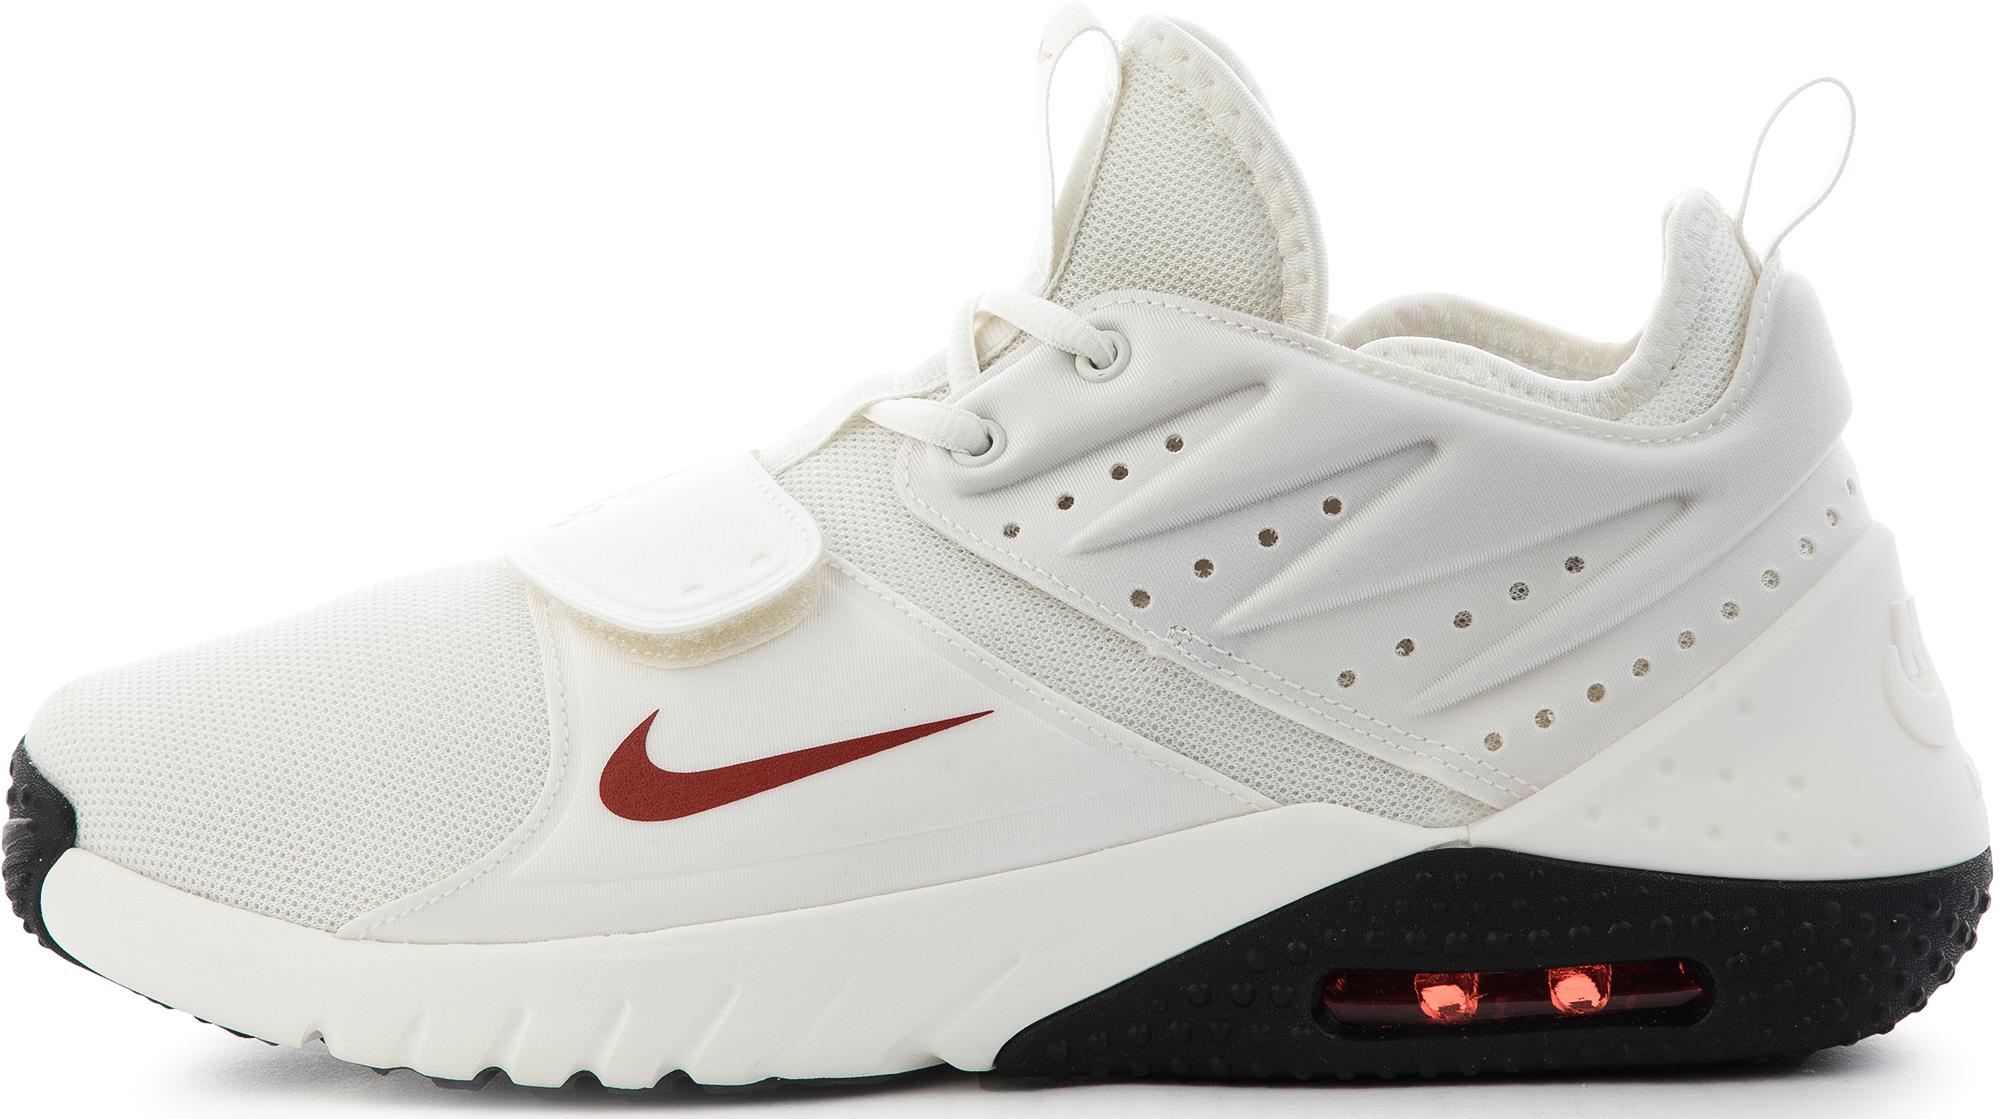 Nike Кроссовки мужские Nike Air Max Trainer 1, размер 41.5 цена